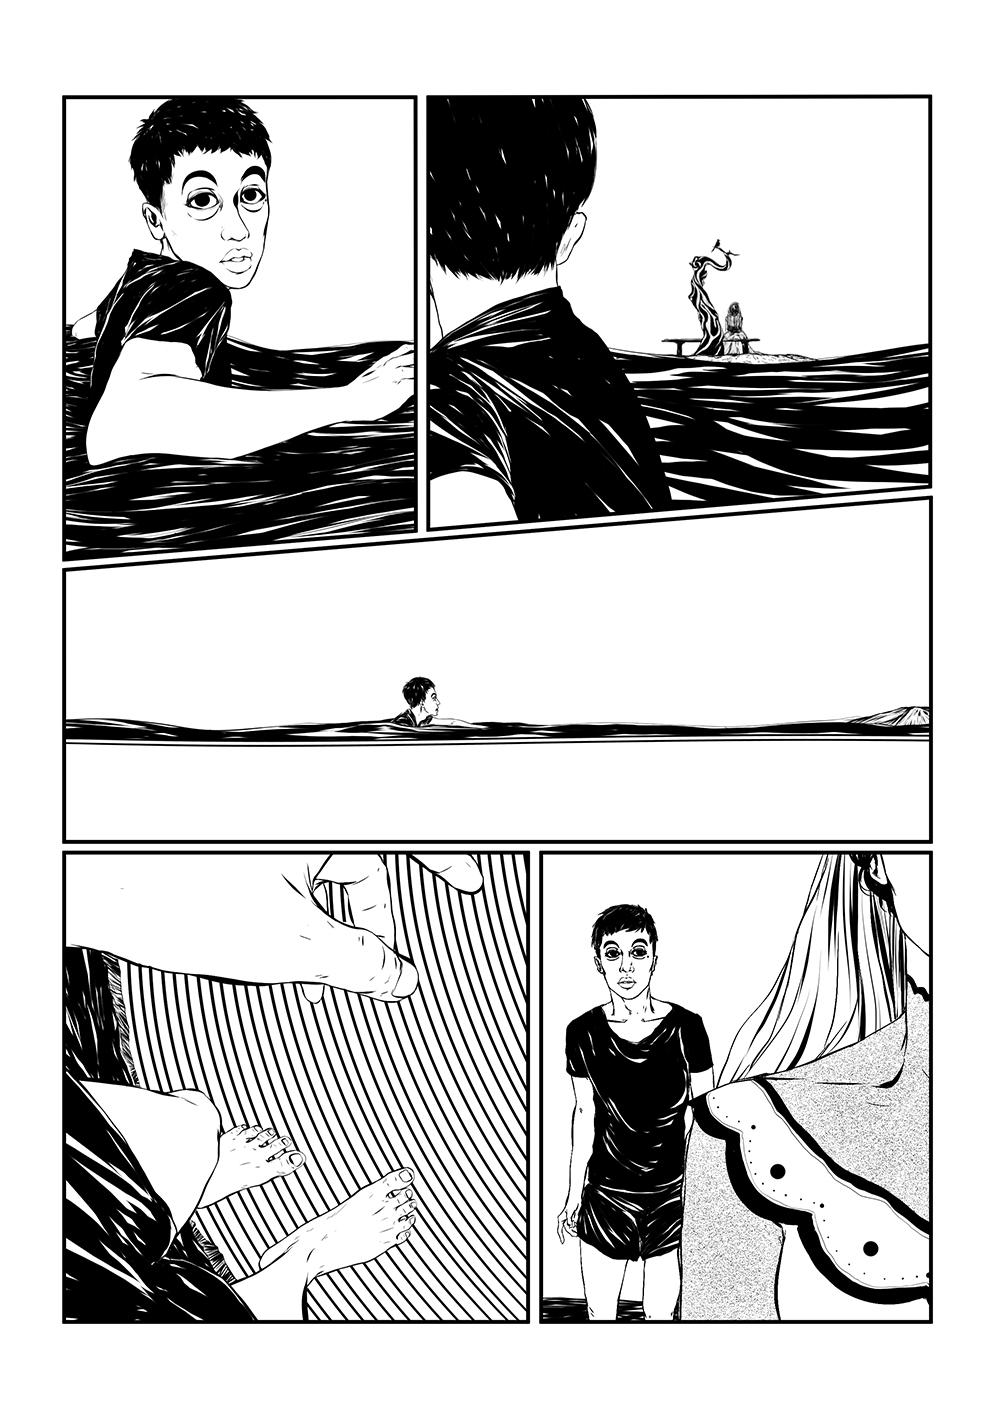 mojowang_illustration_betweenrivers_21_9.jpg